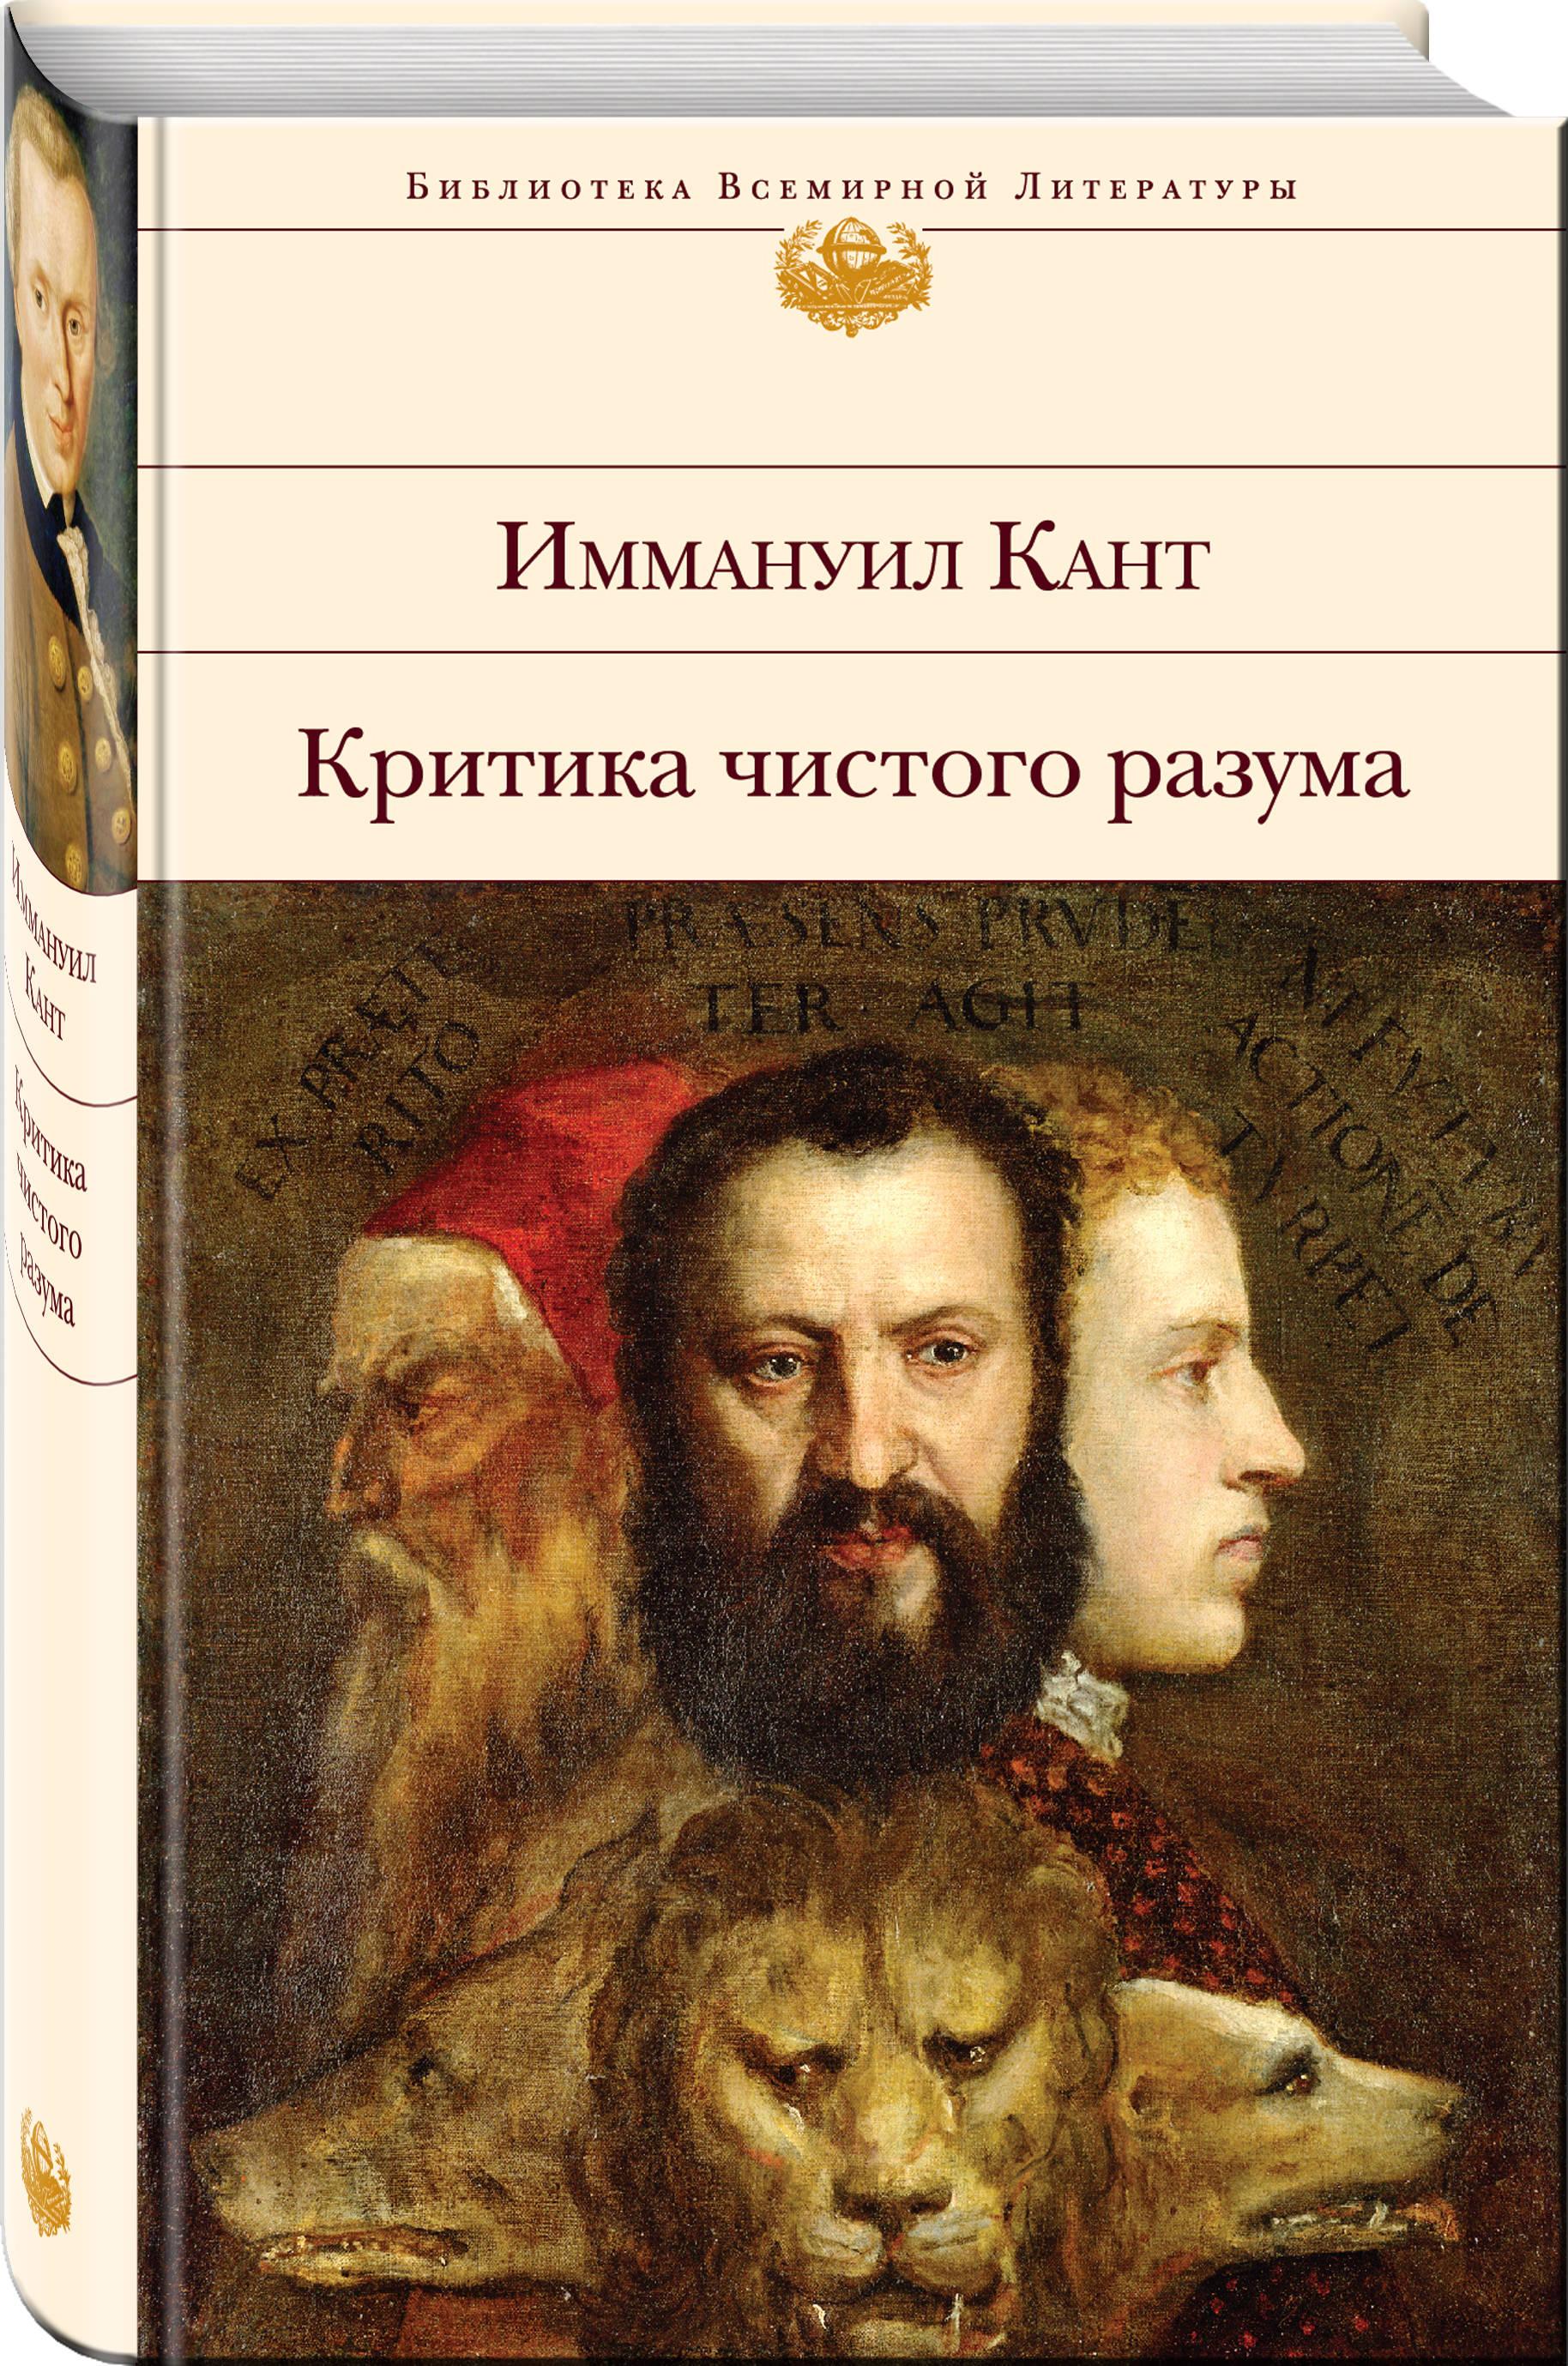 Критика чистого разума ( Кант И.  )